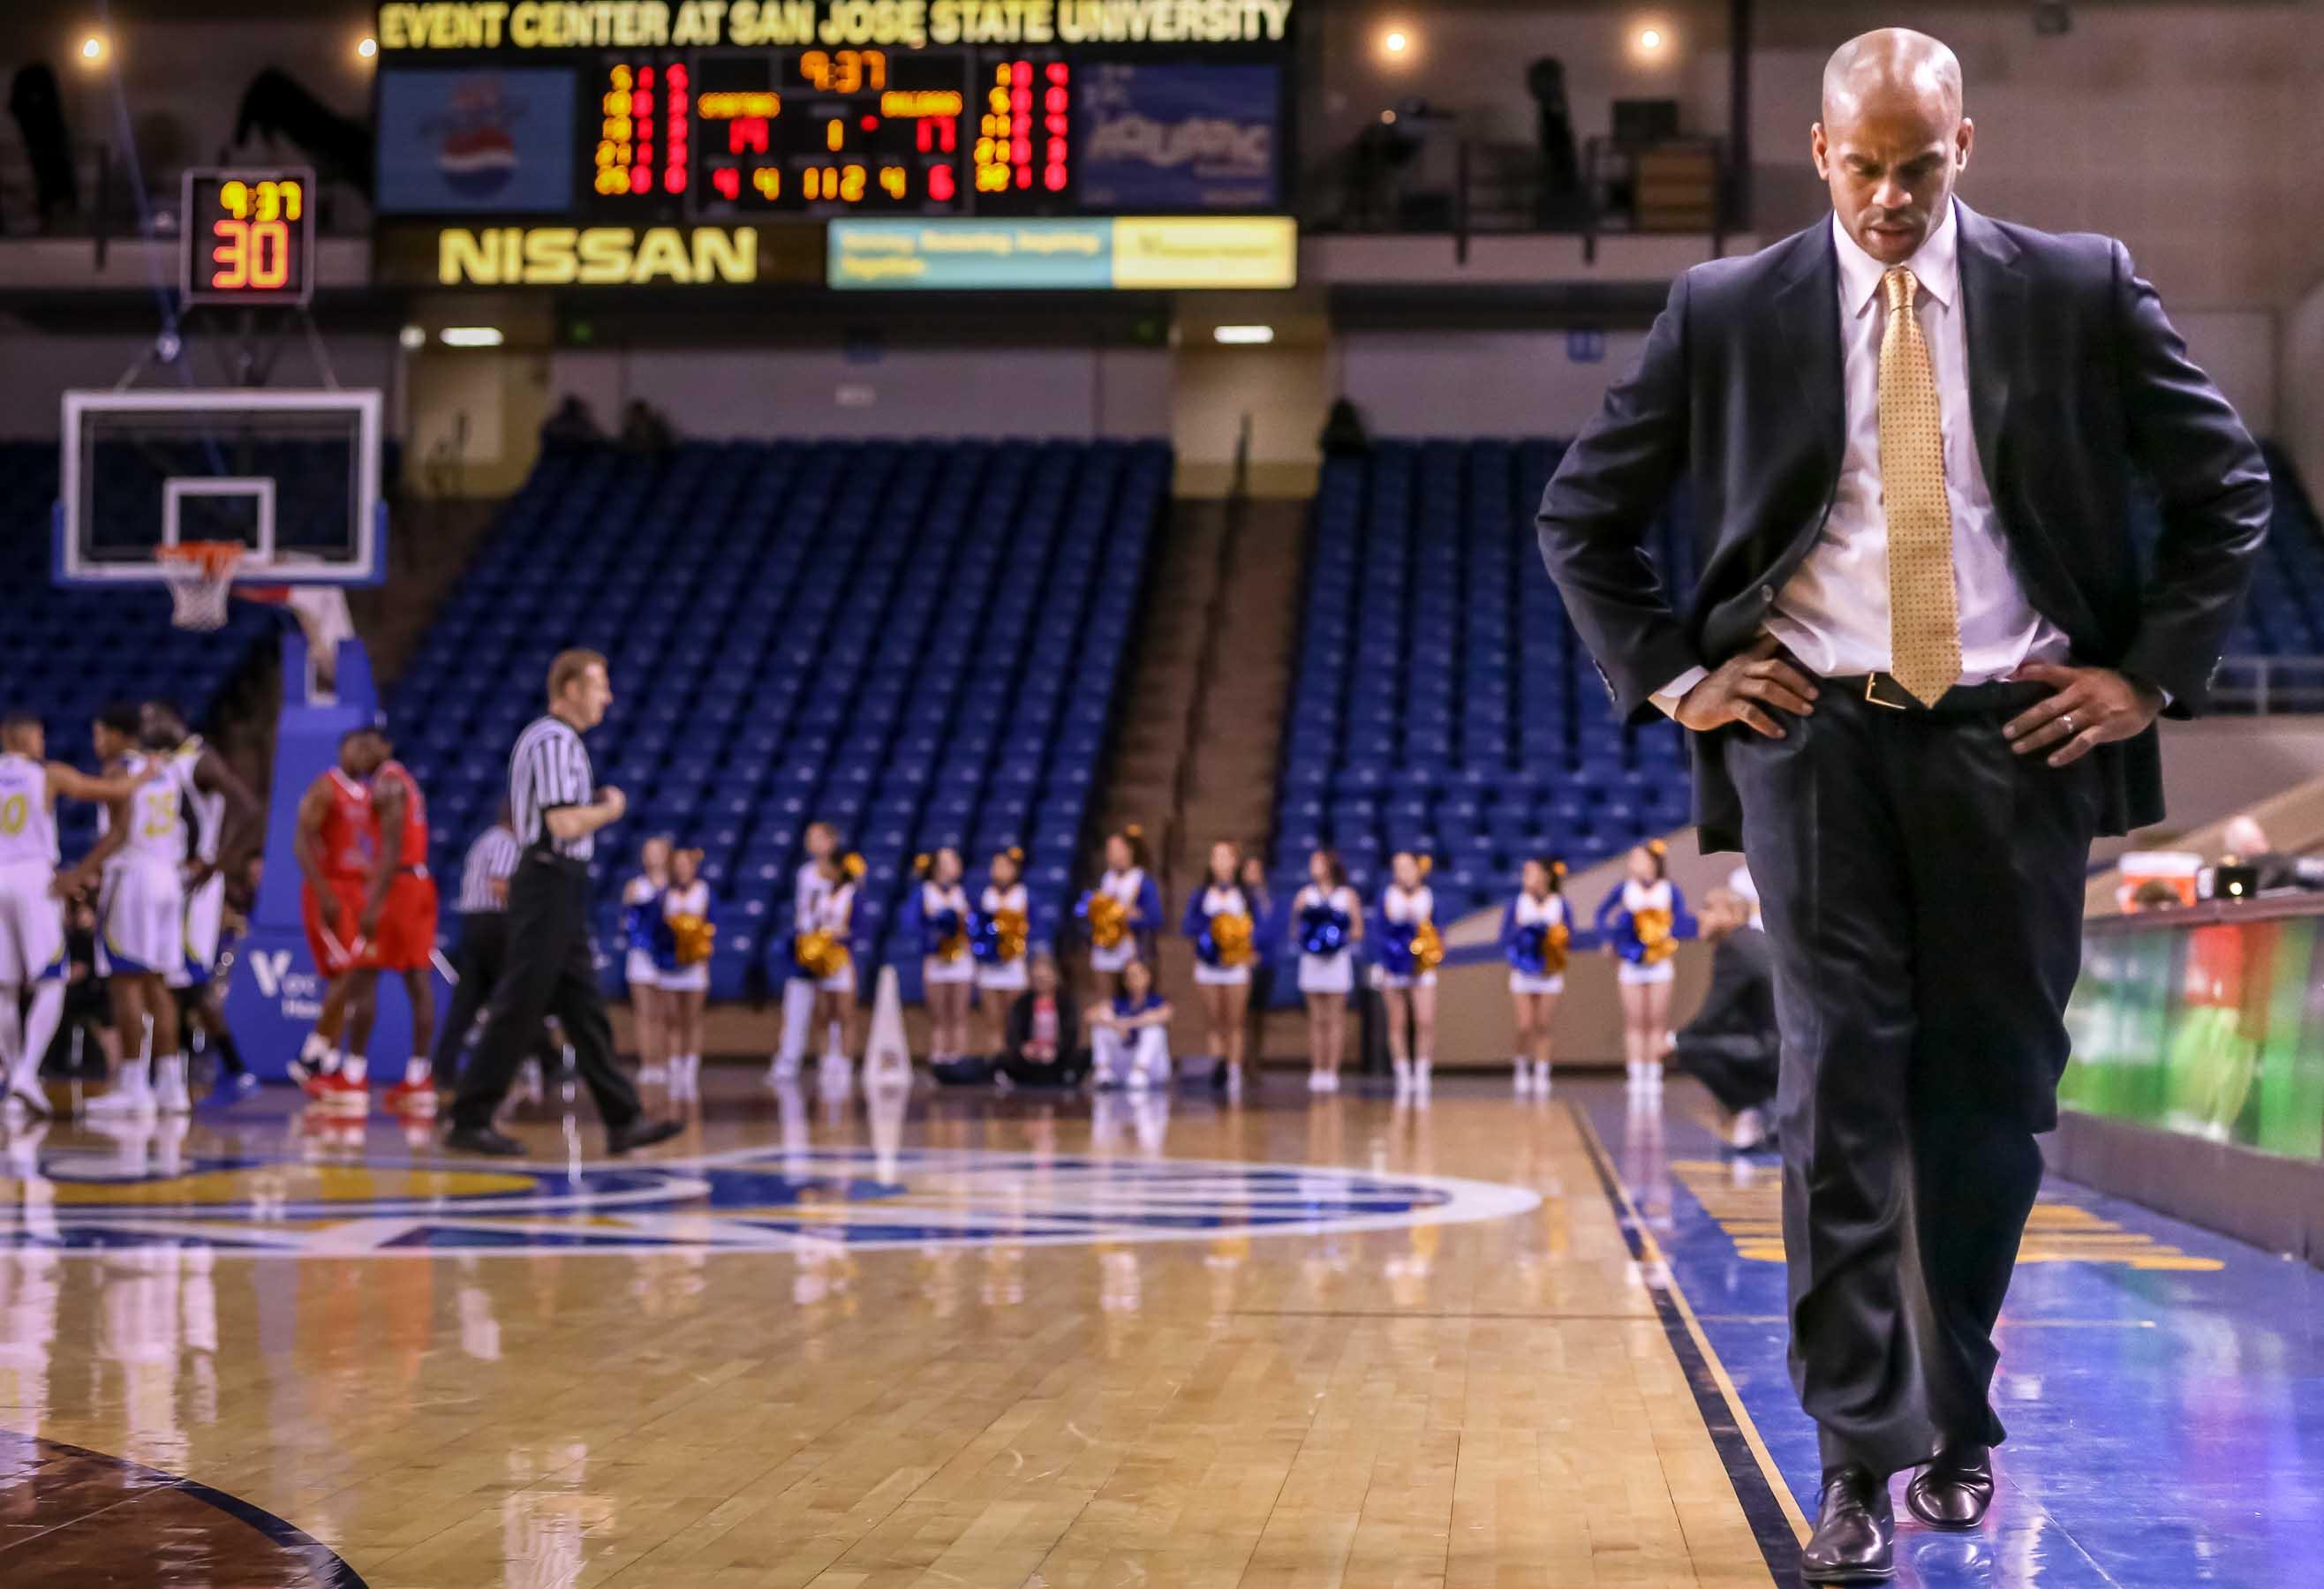 San Jose State head coach, Jean Prioleau